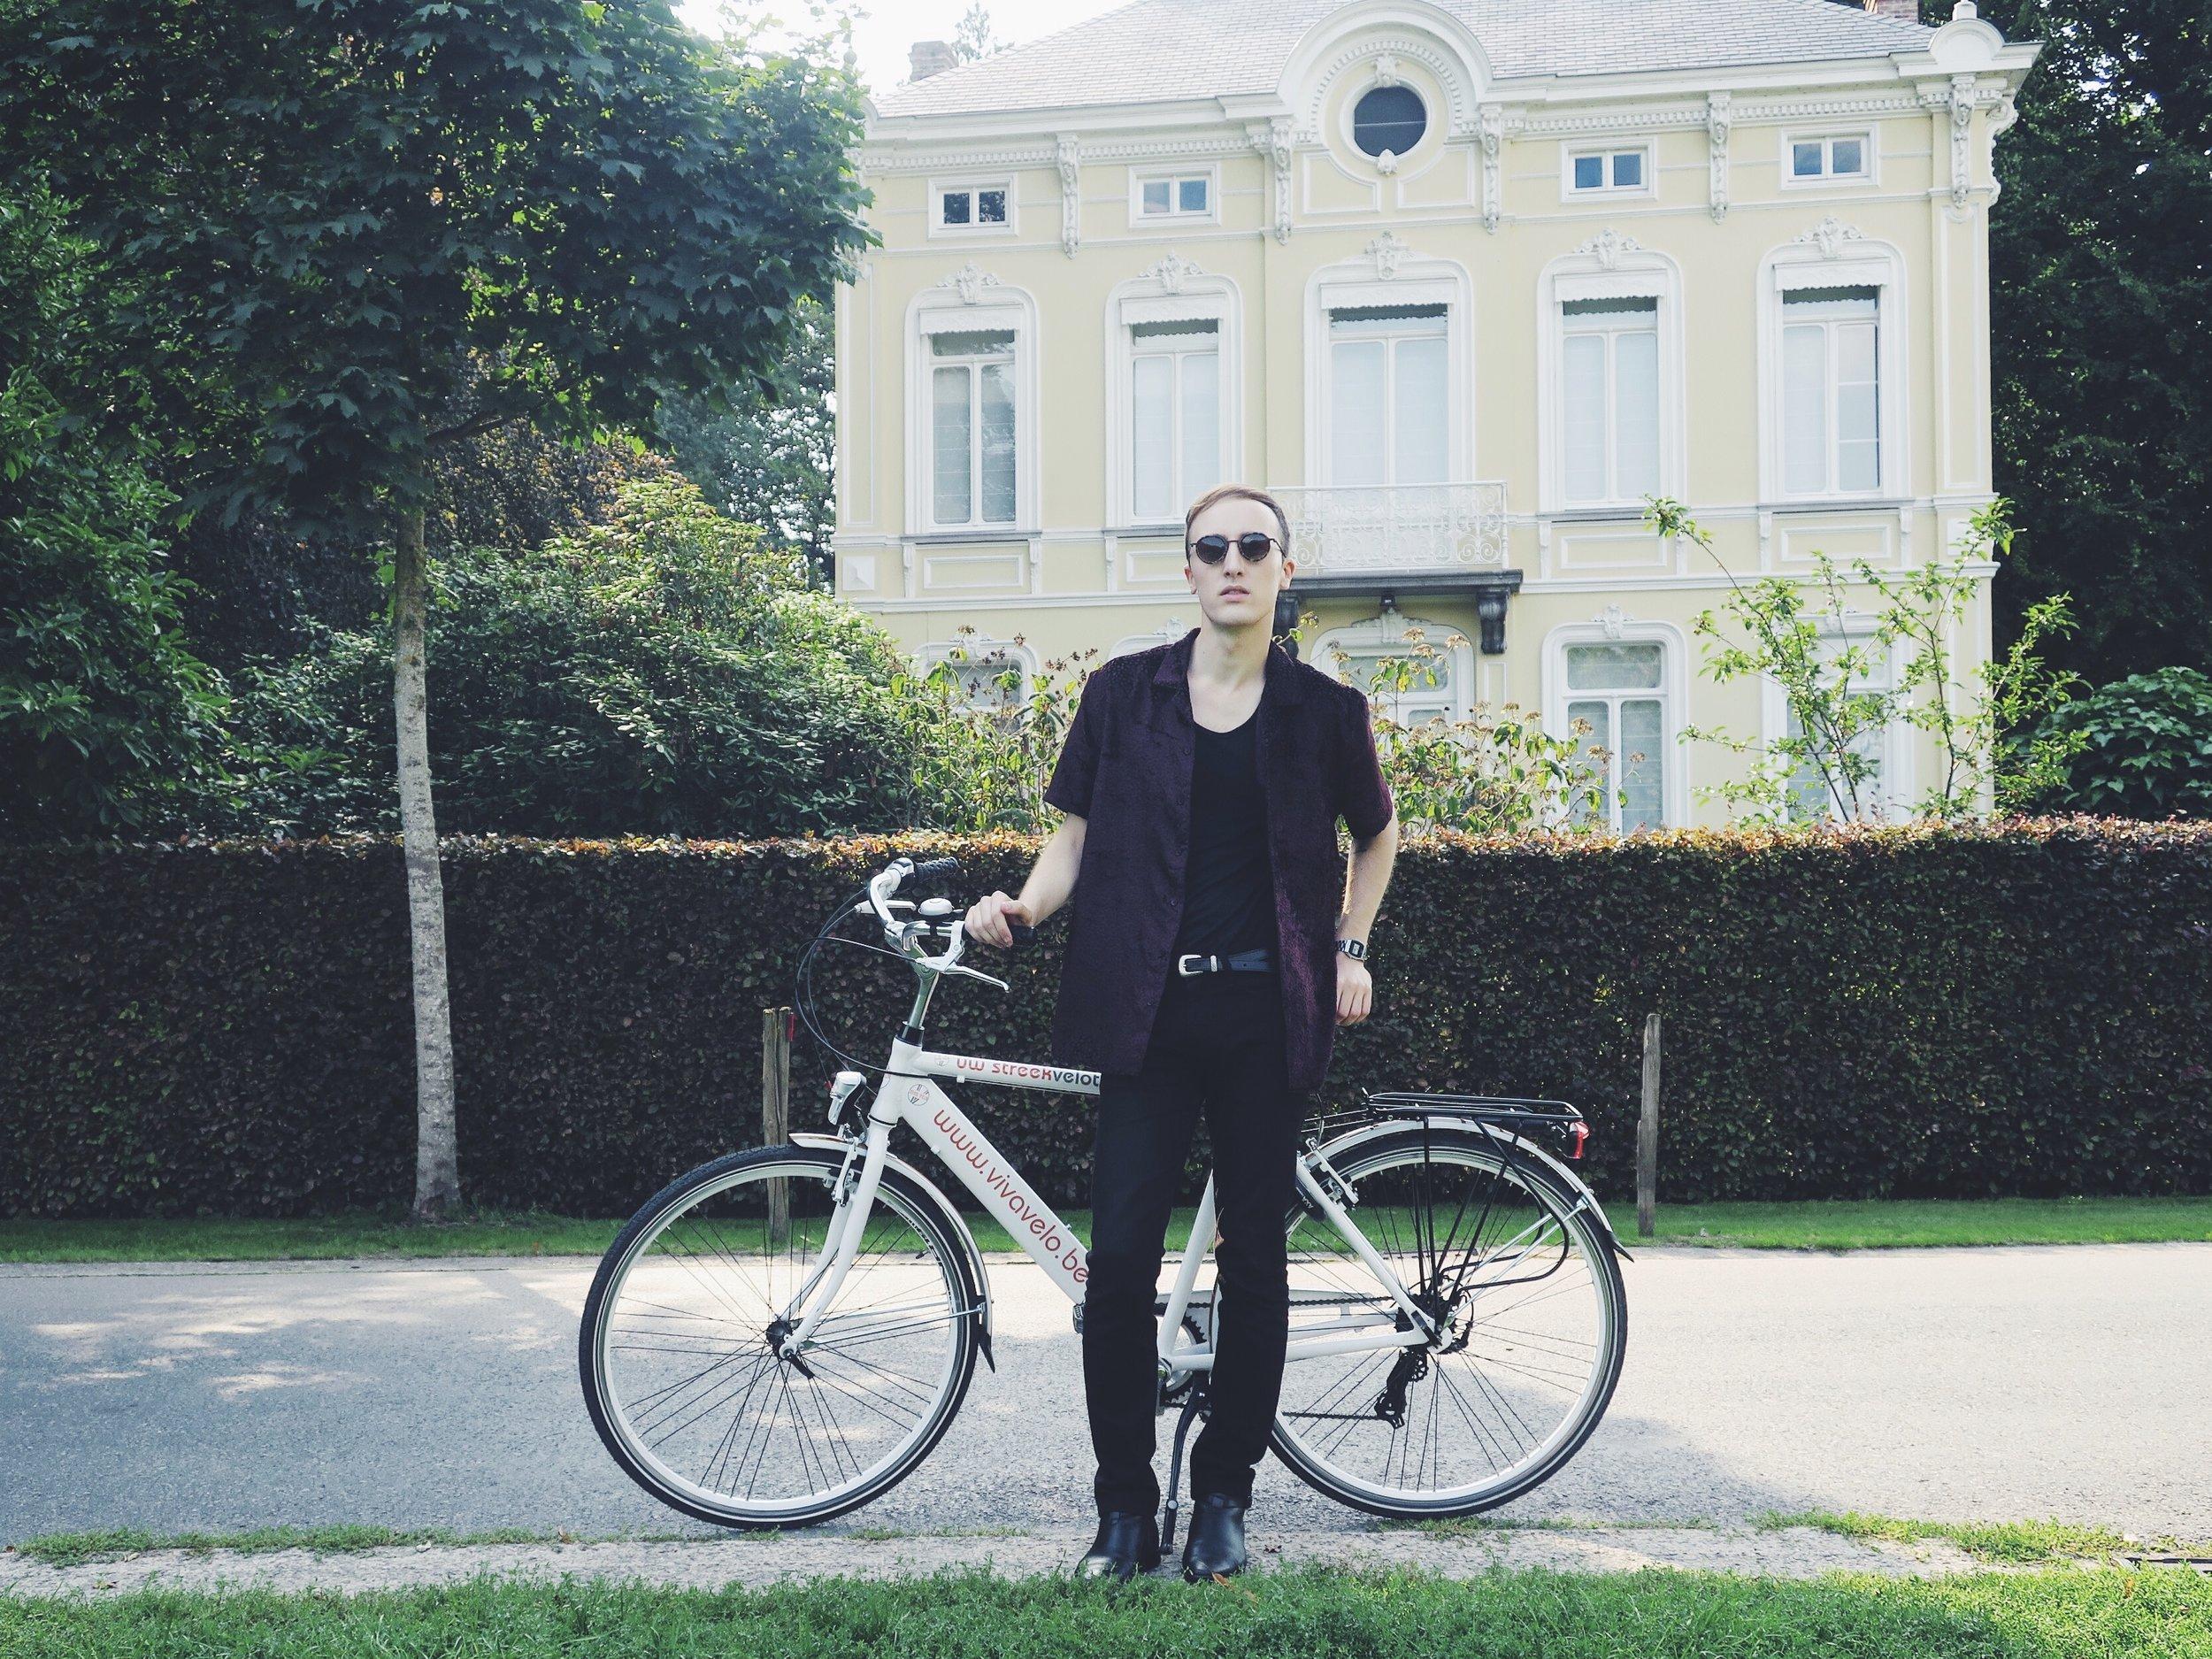 Asos shirt - Calvin Klein Jeans trousers - Sacha ankle boots - Komono sunglasses